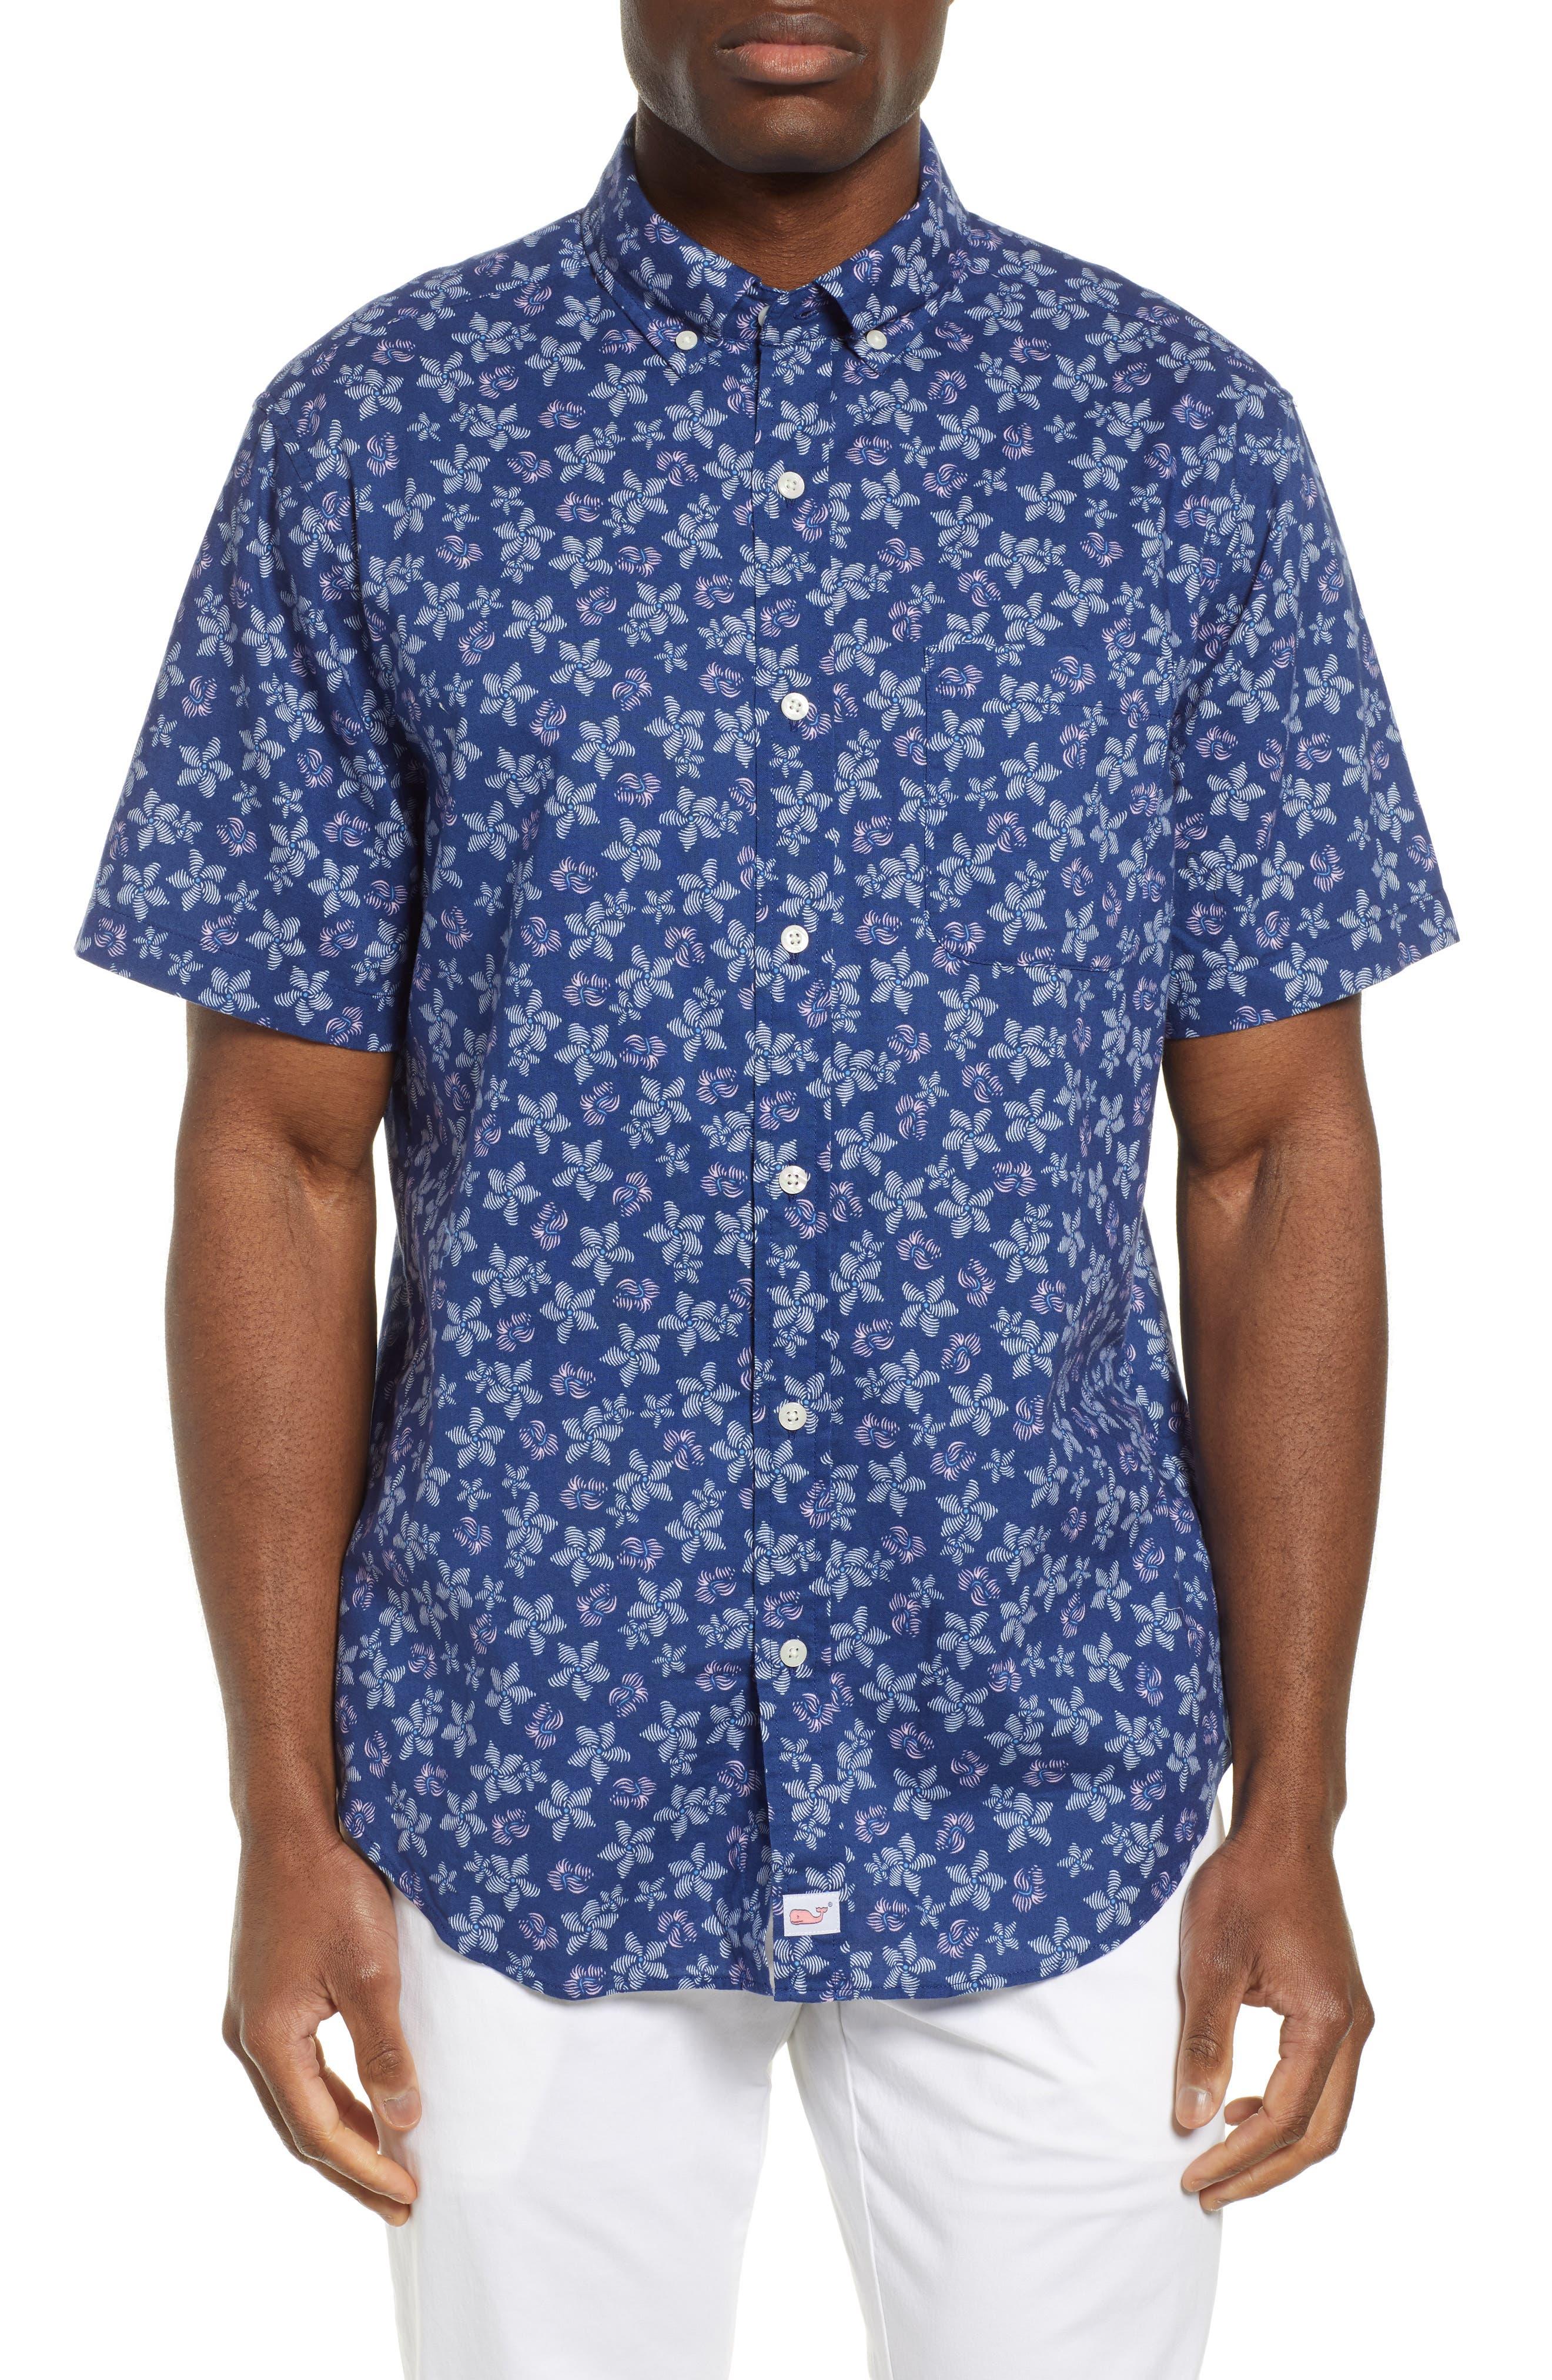 VINEYARD VINES, Murray Slim Fit Floral Print Sport Shirt, Main thumbnail 1, color, DEEP BAY